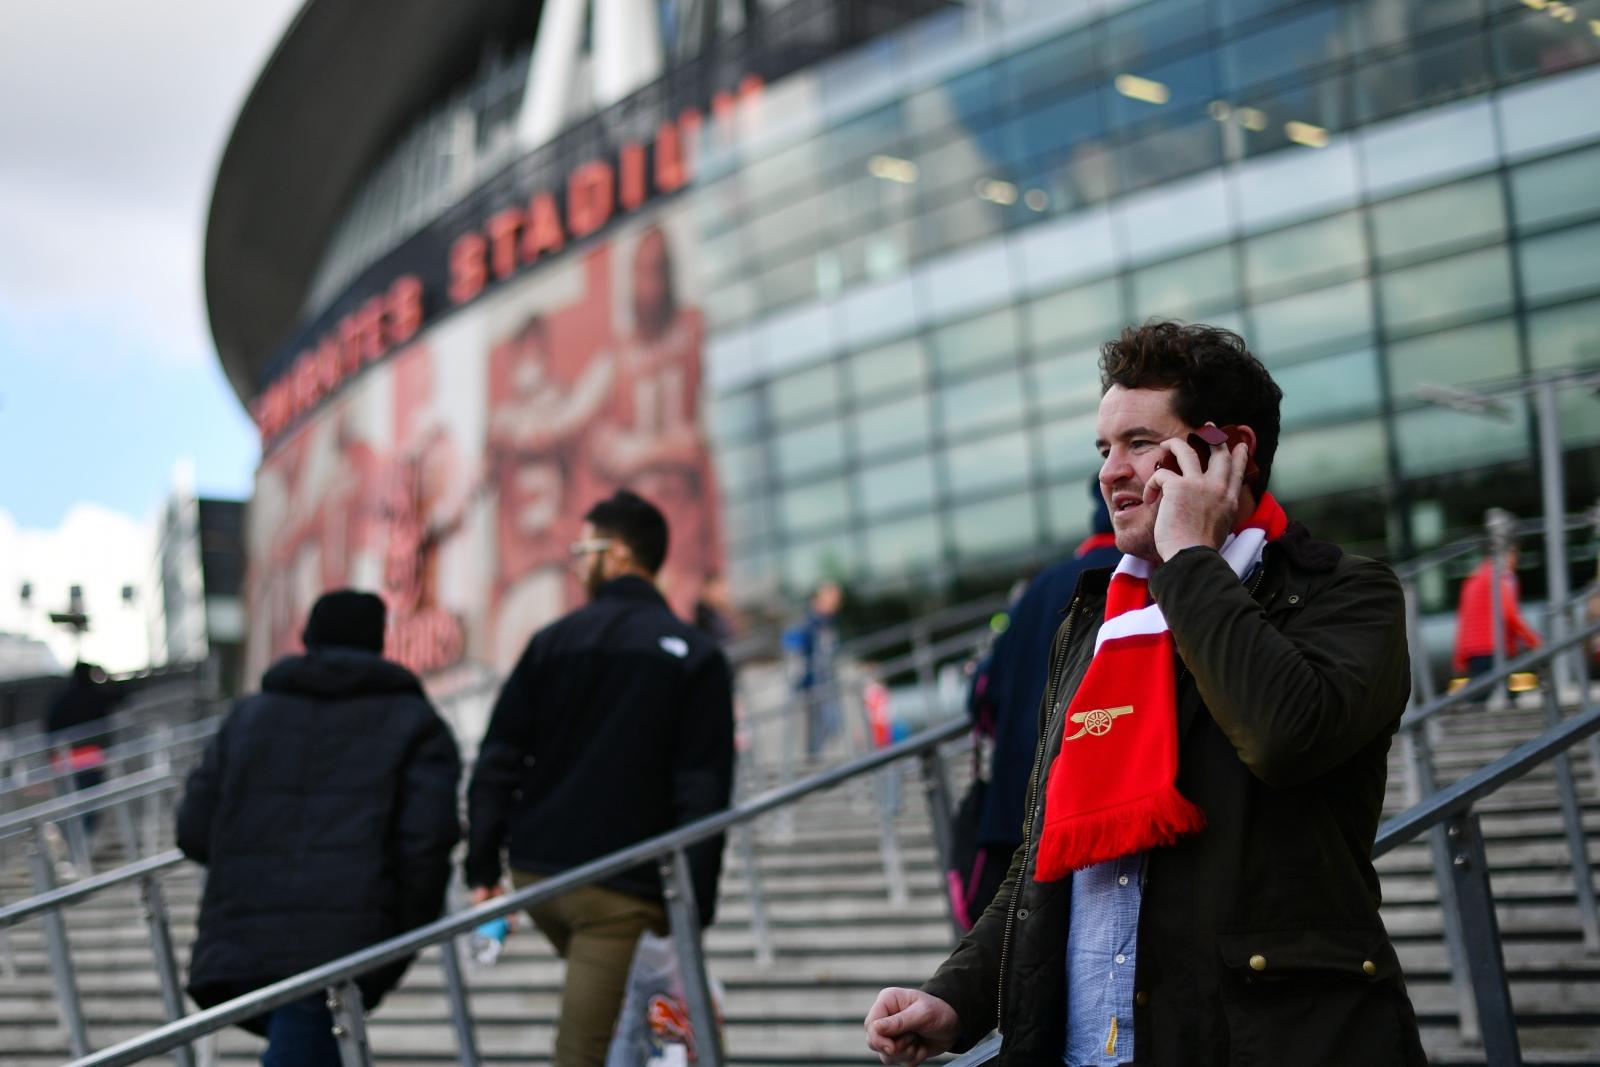 An Arsenal fan before kick-off